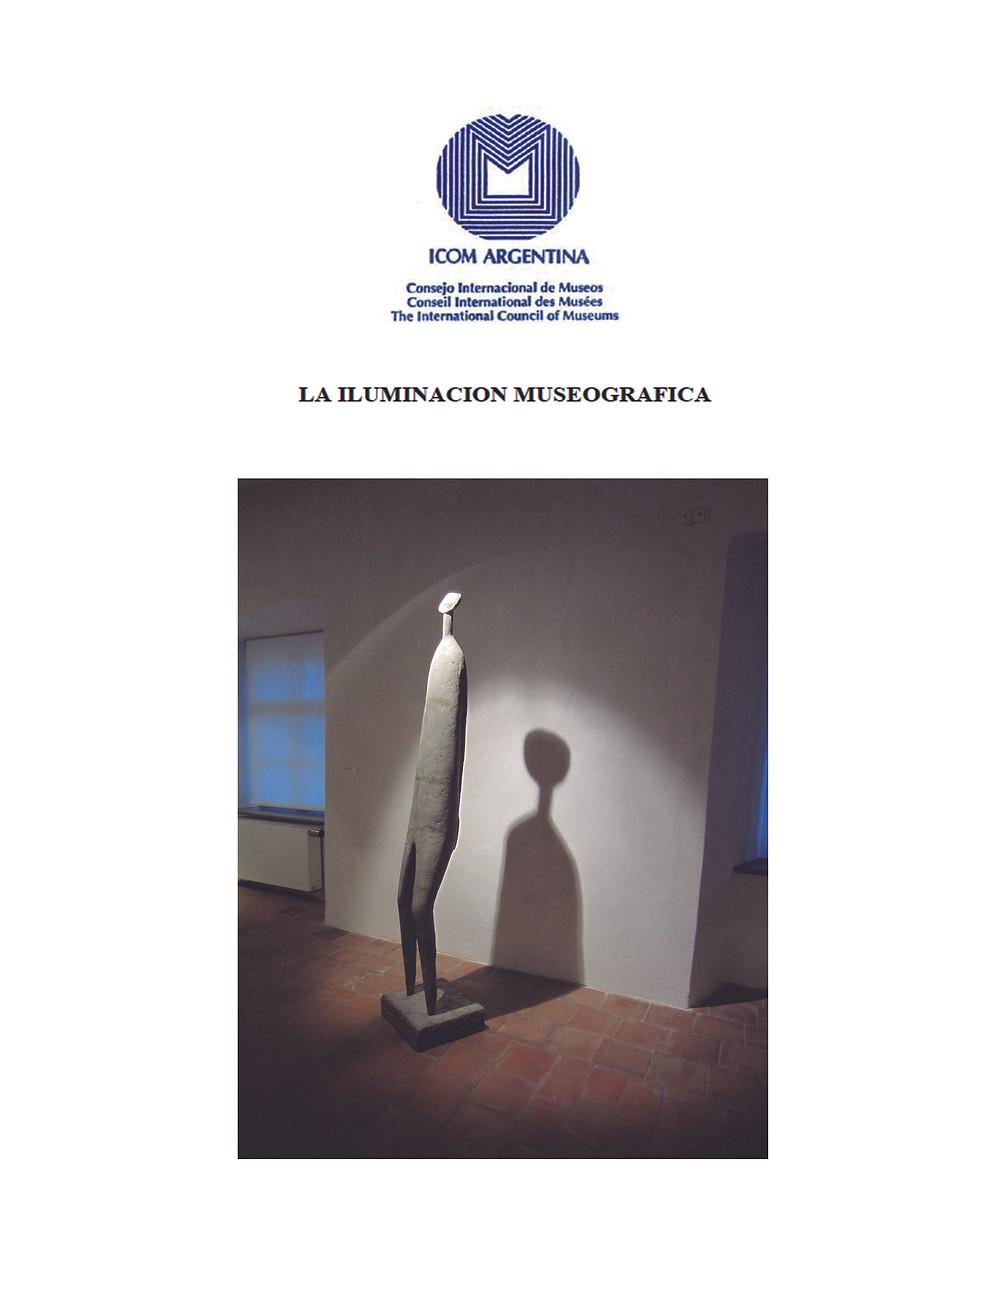 Iluminación museográfica